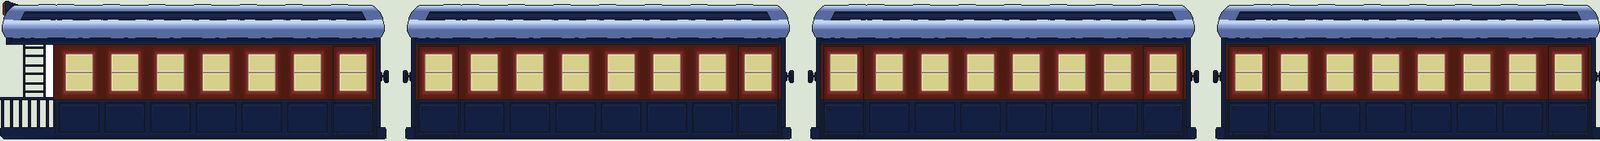 Polar Express Car